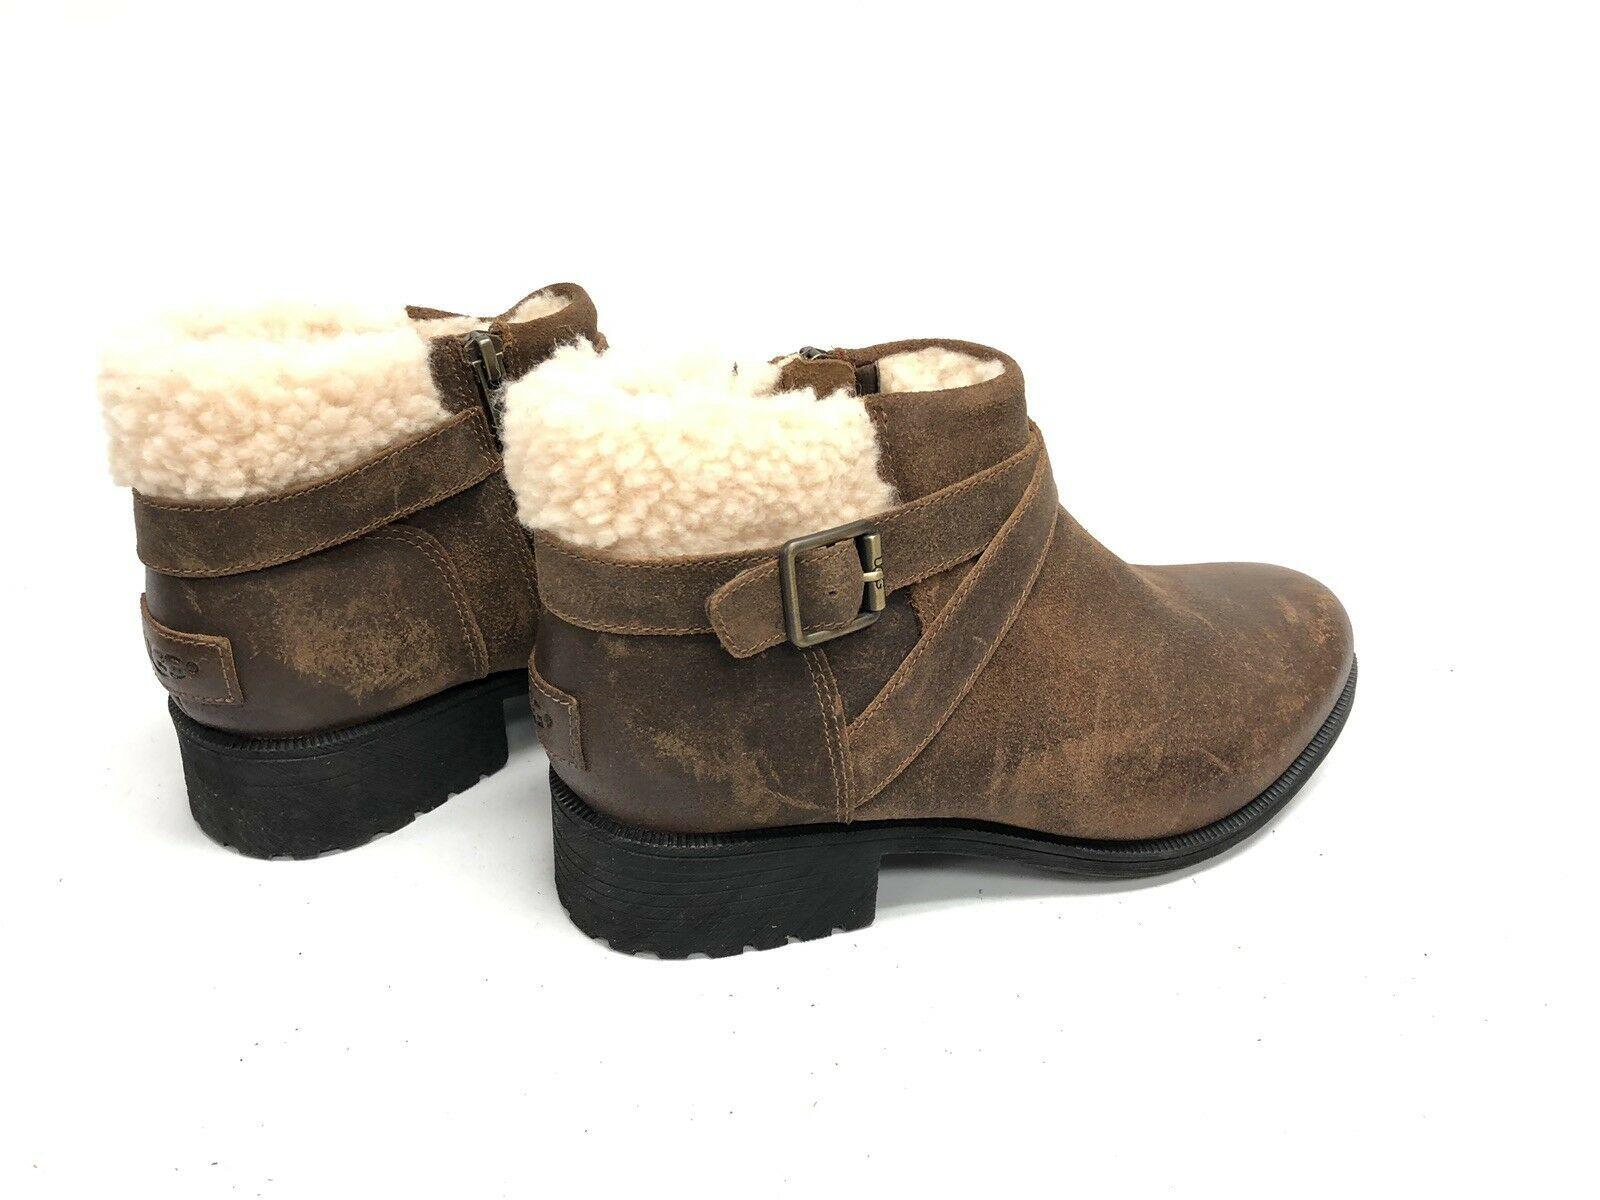 UGG Australia BENSON Buckle Sheepskin Ankle Booties 1095151 Chipmunk Waterproof image 6